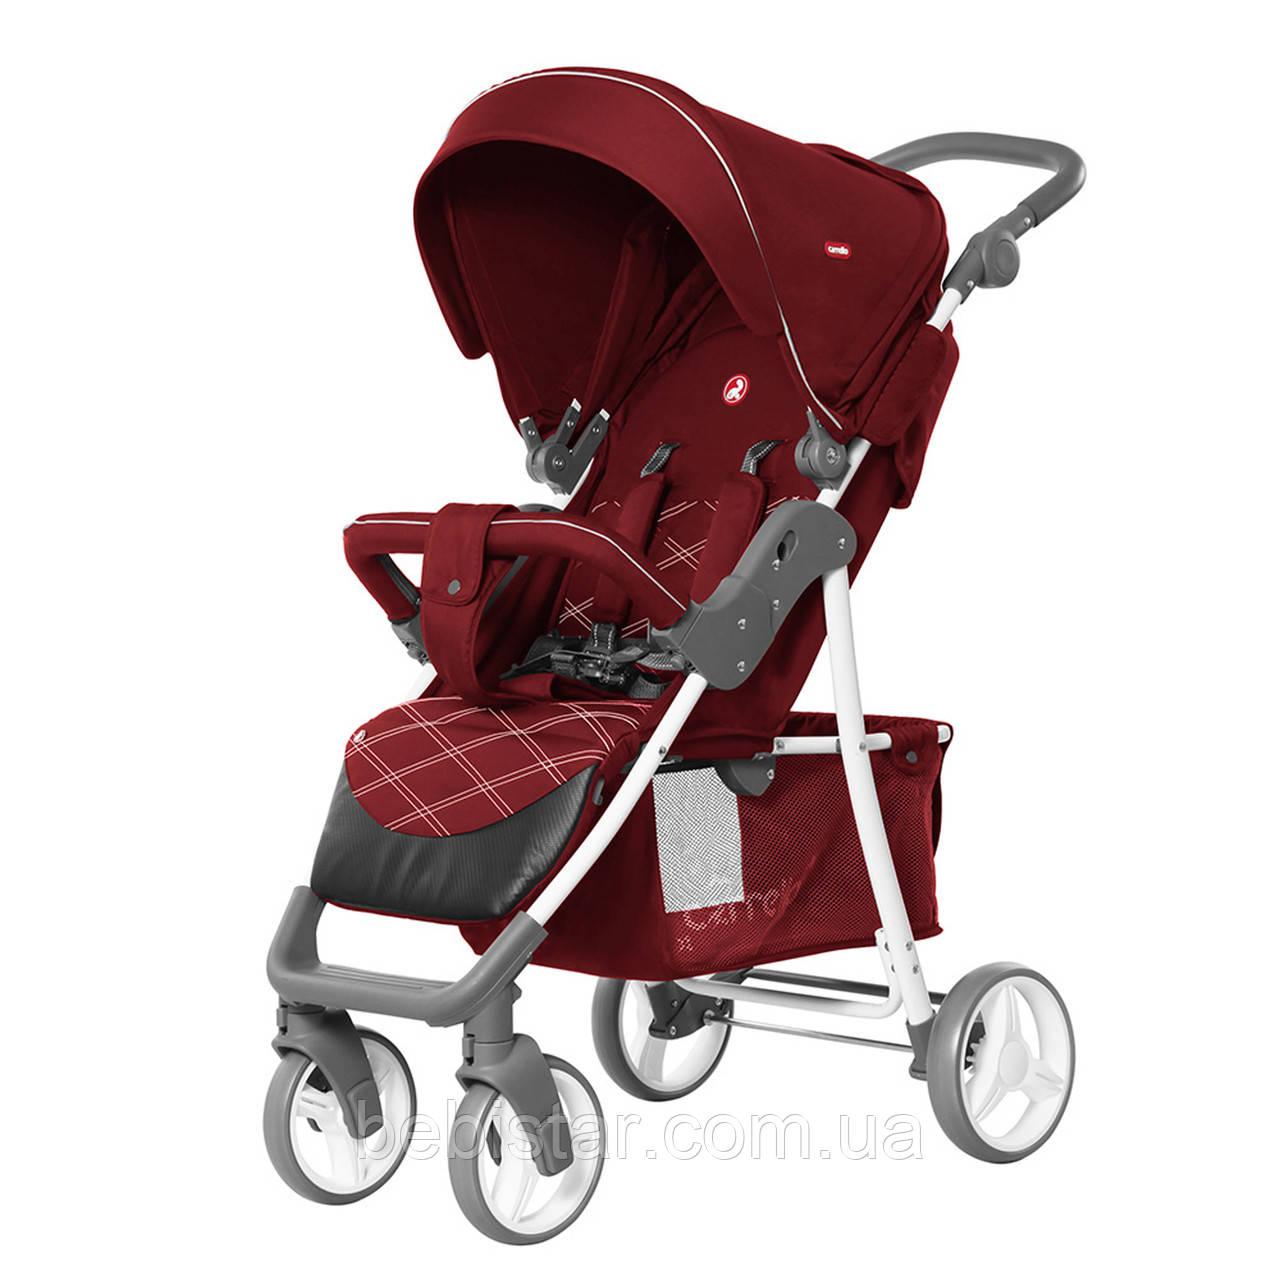 Детская прогулочная коляска с дождевиком красная, белая рама CARRELLO Quattro CRL-8502/2 Cherry Red